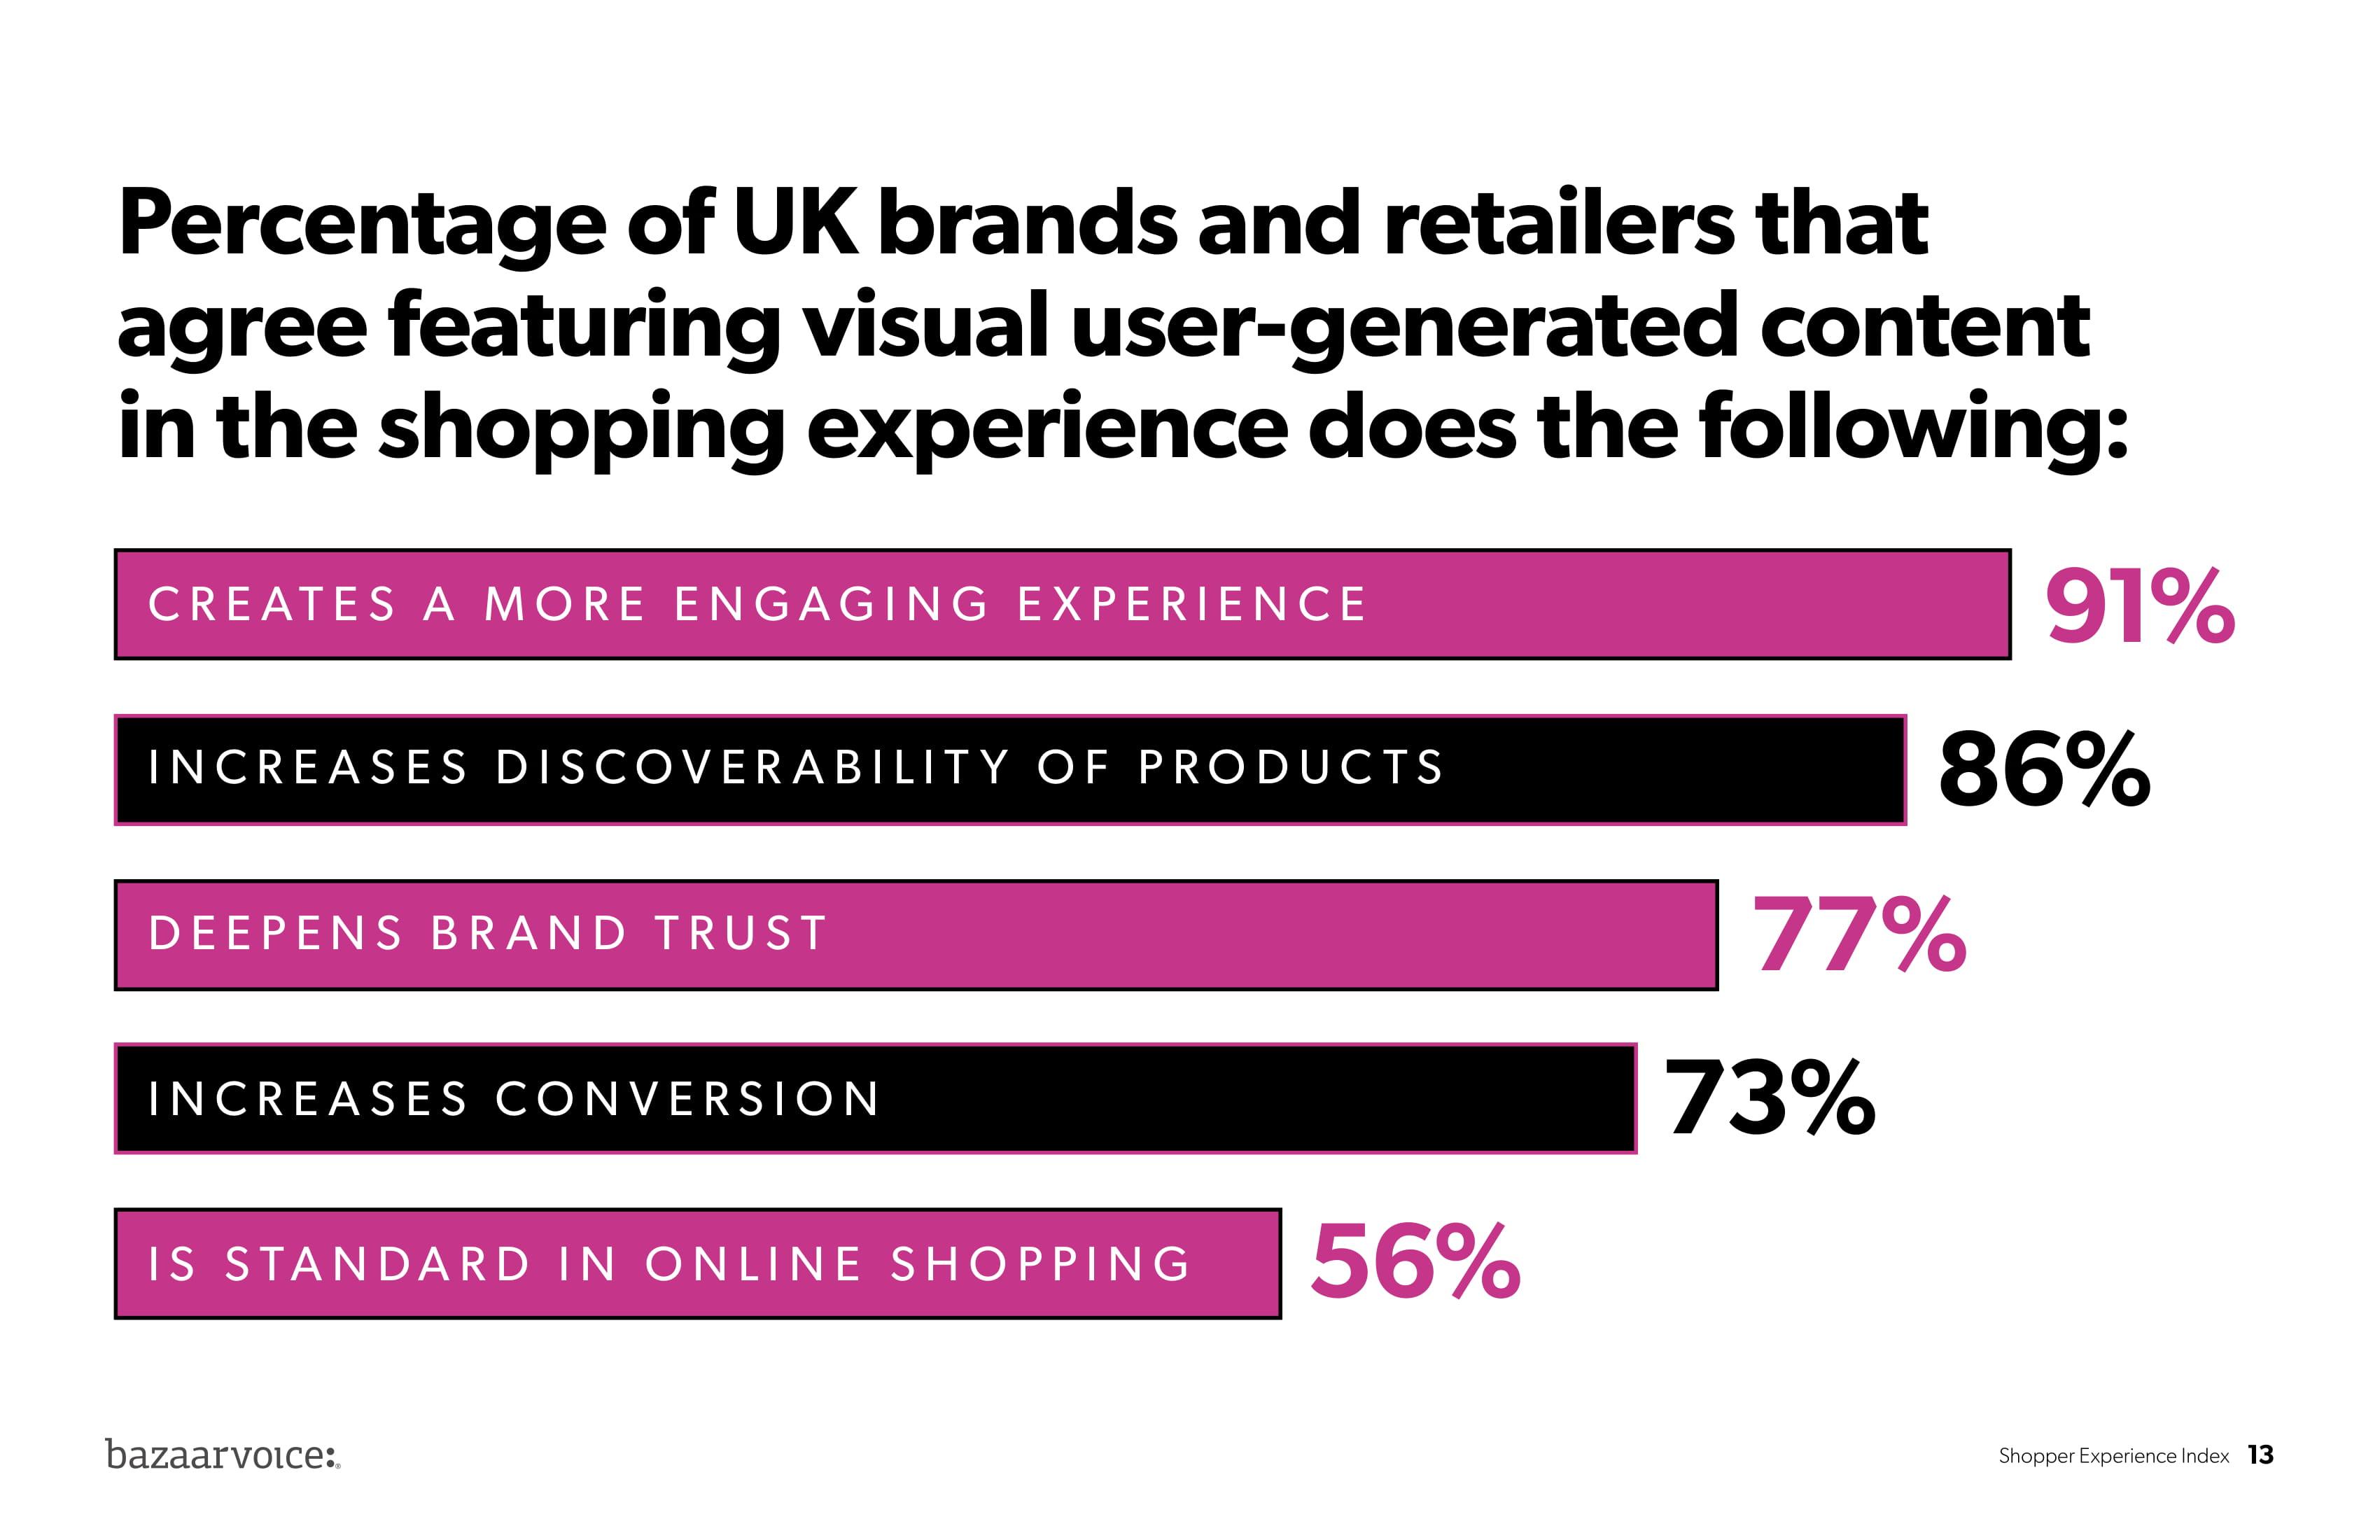 Bazaarvoice:消费者体验指数报告